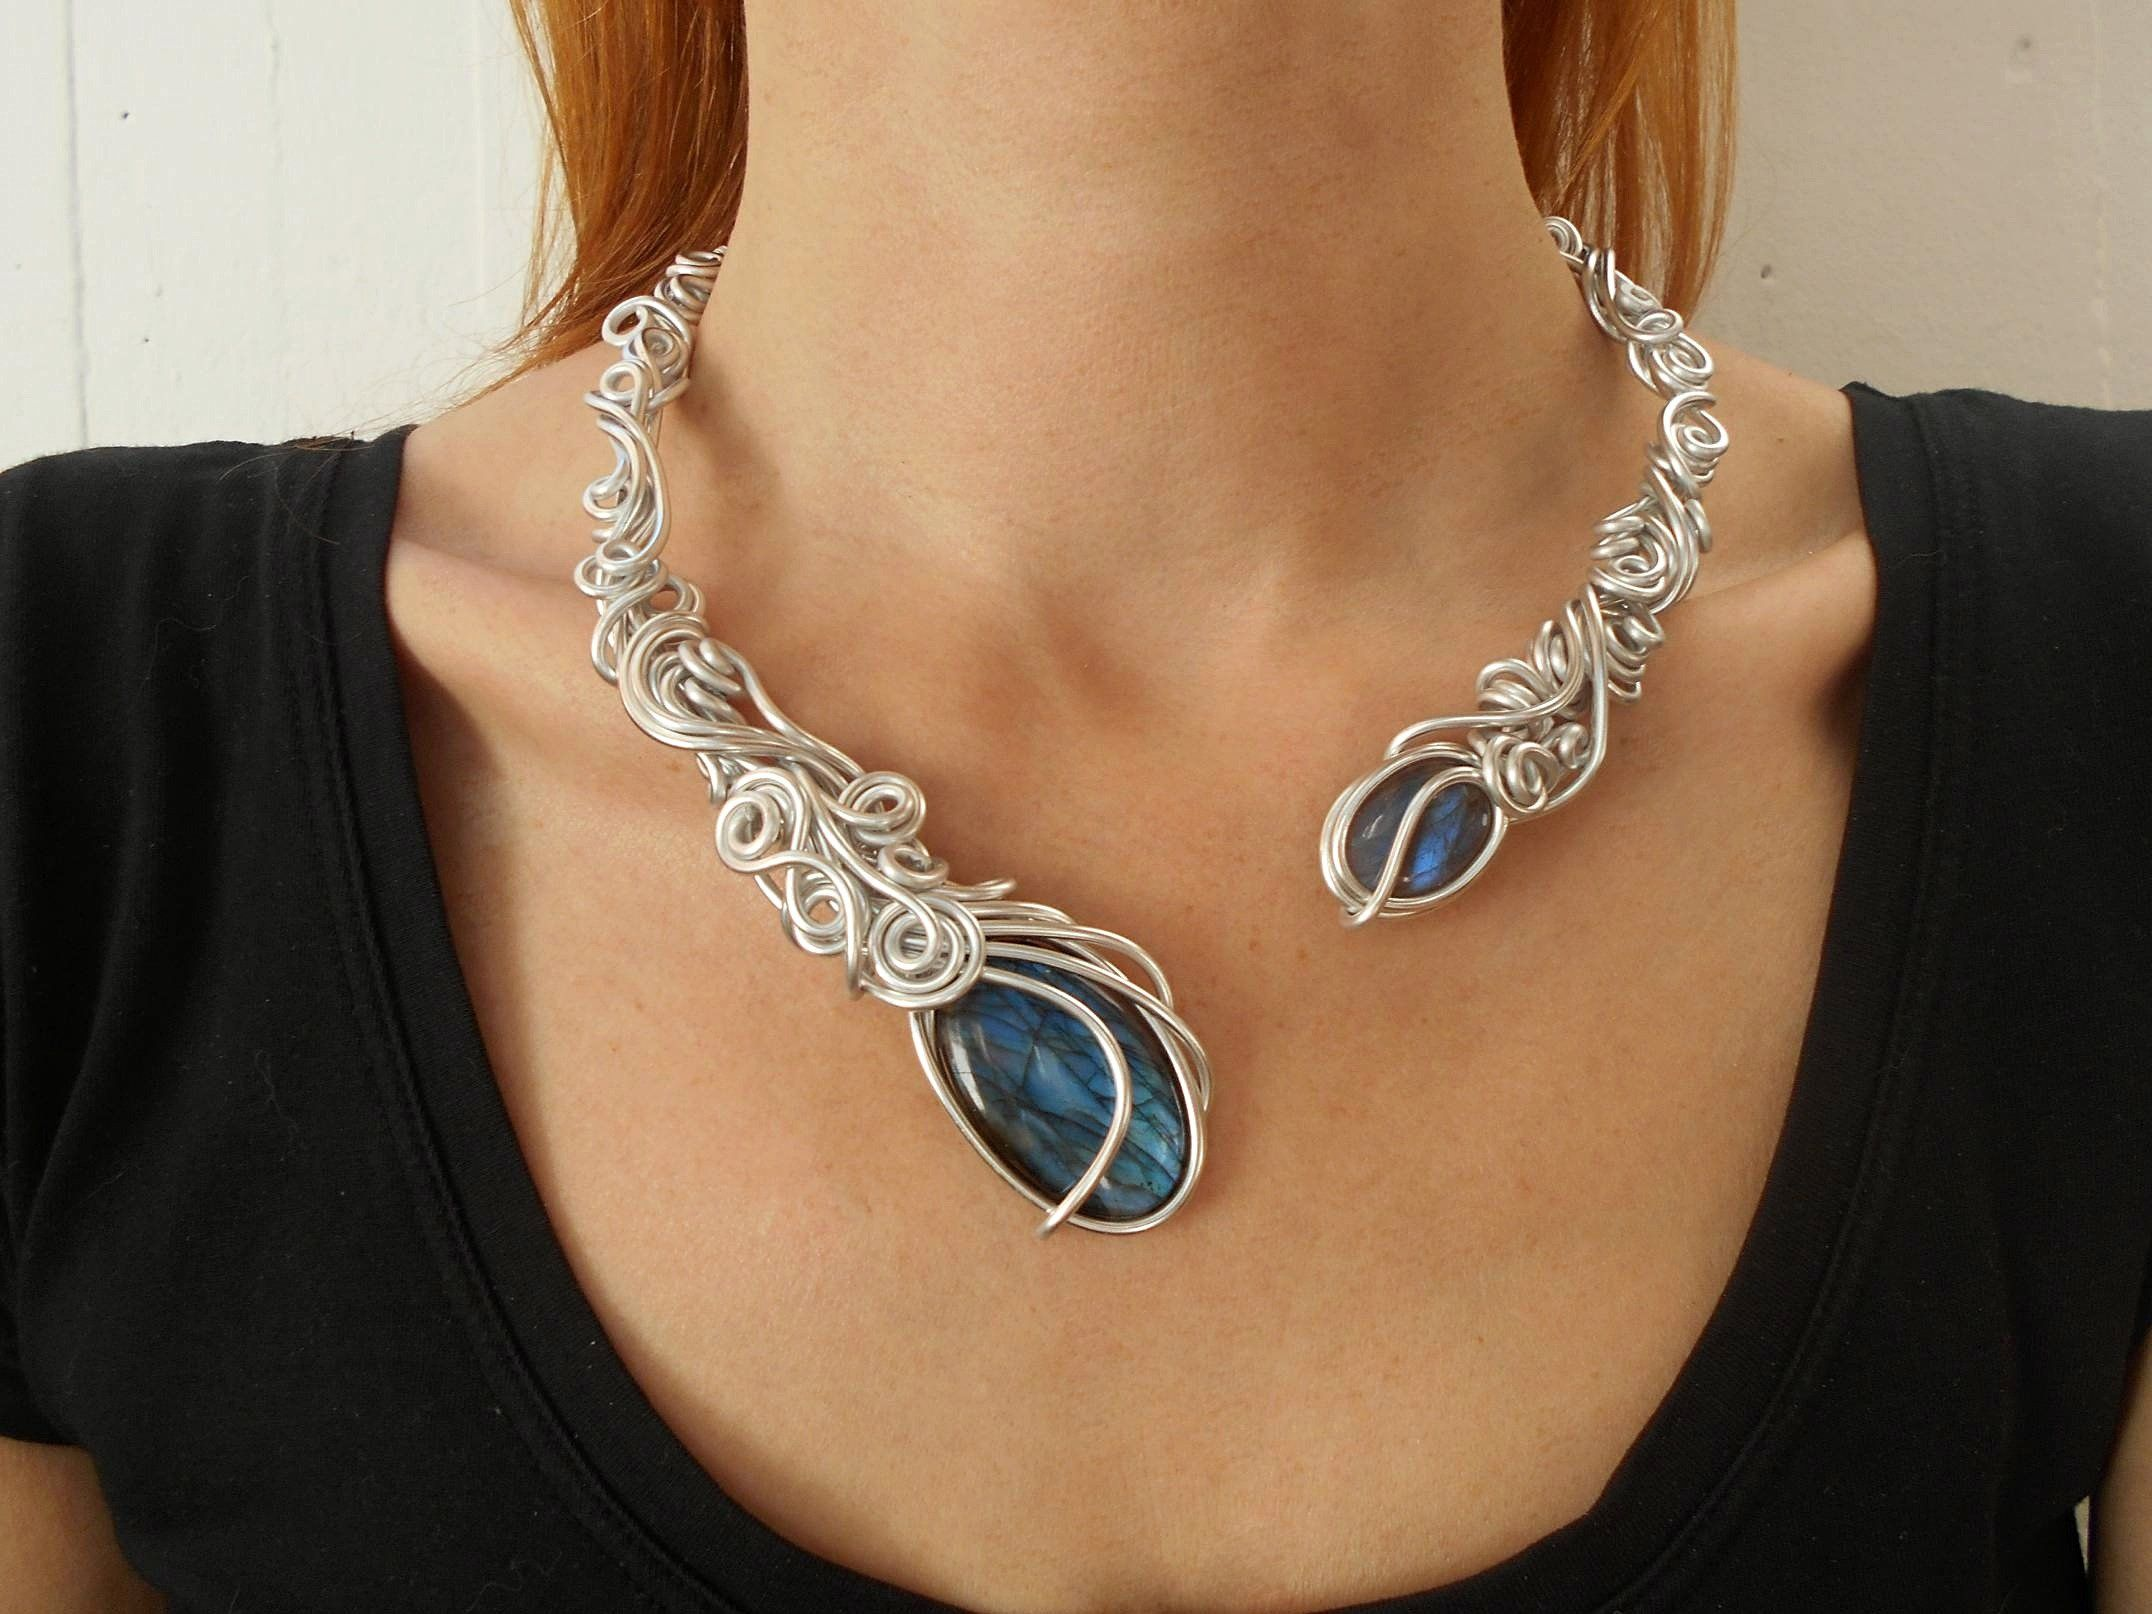 Handmade Aluminum Wire Open Necklace Choker Boho Unusual Unique Collar Necklace Statement Jewelry